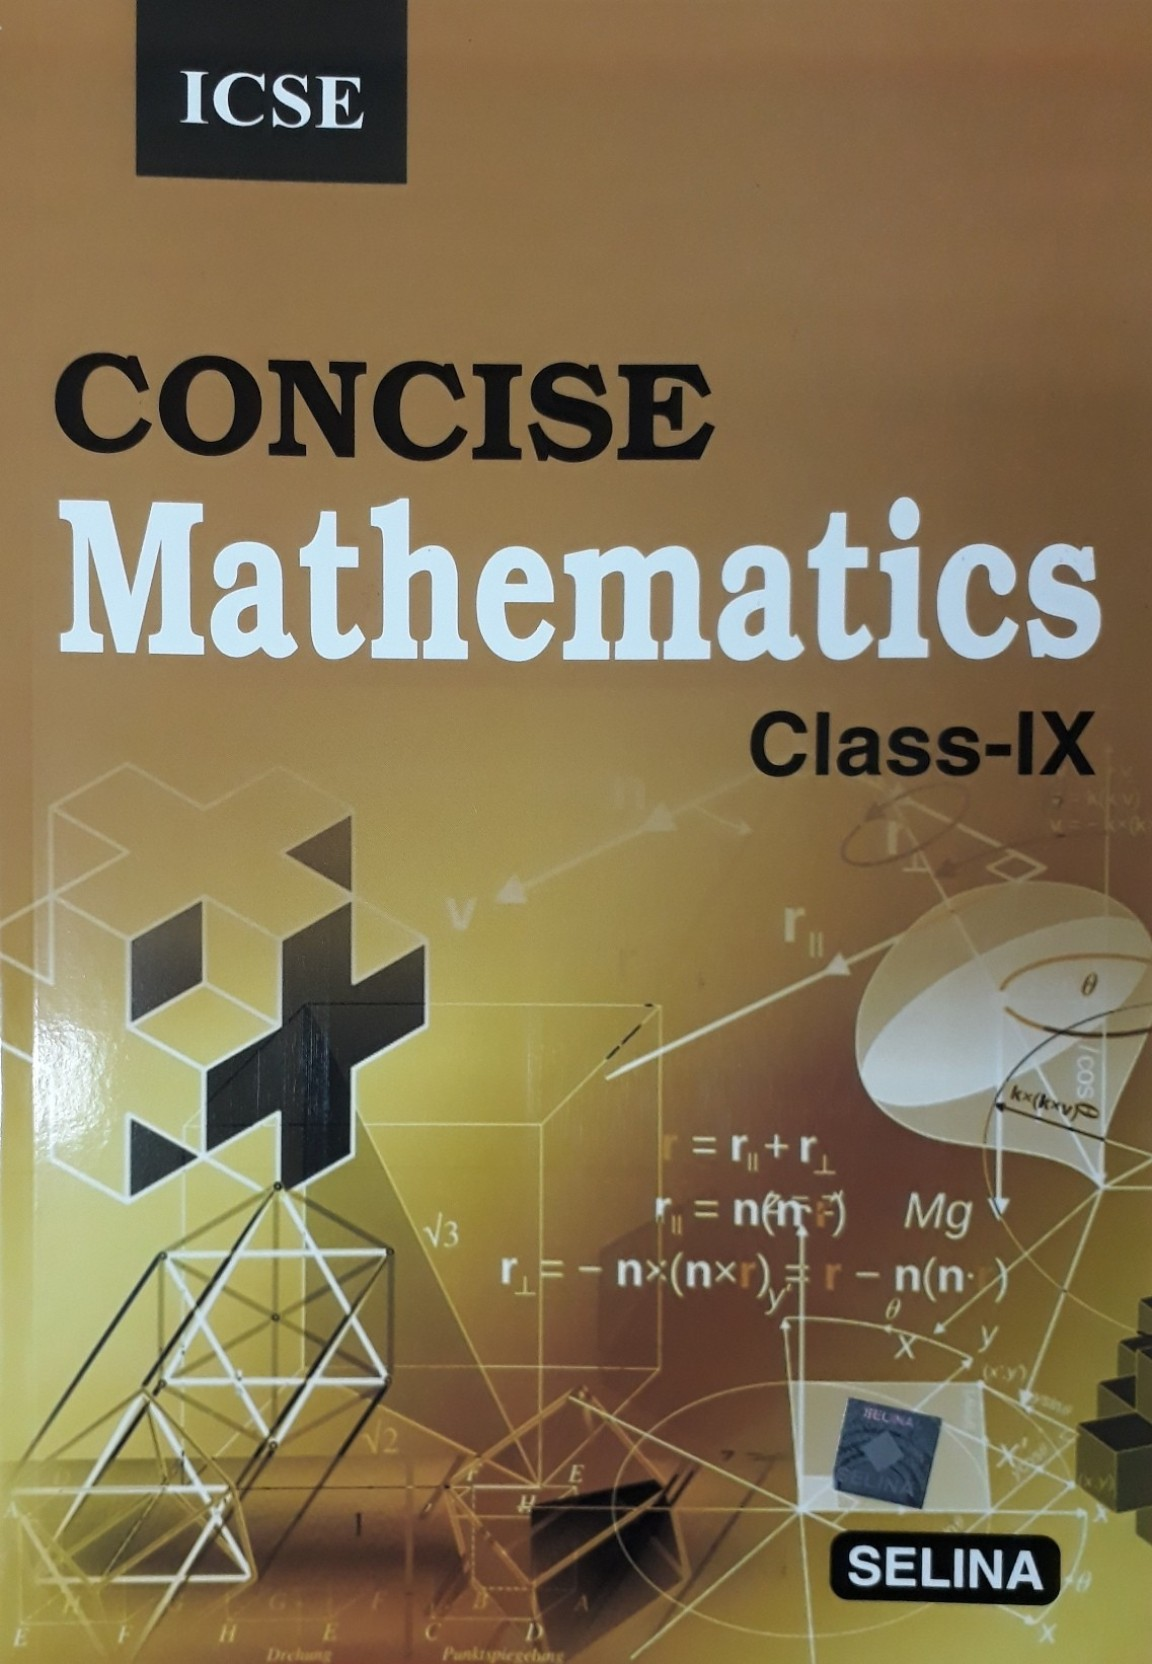 ICSE CONCISE MATHEMATICS CLASS IX. ADD TO CART